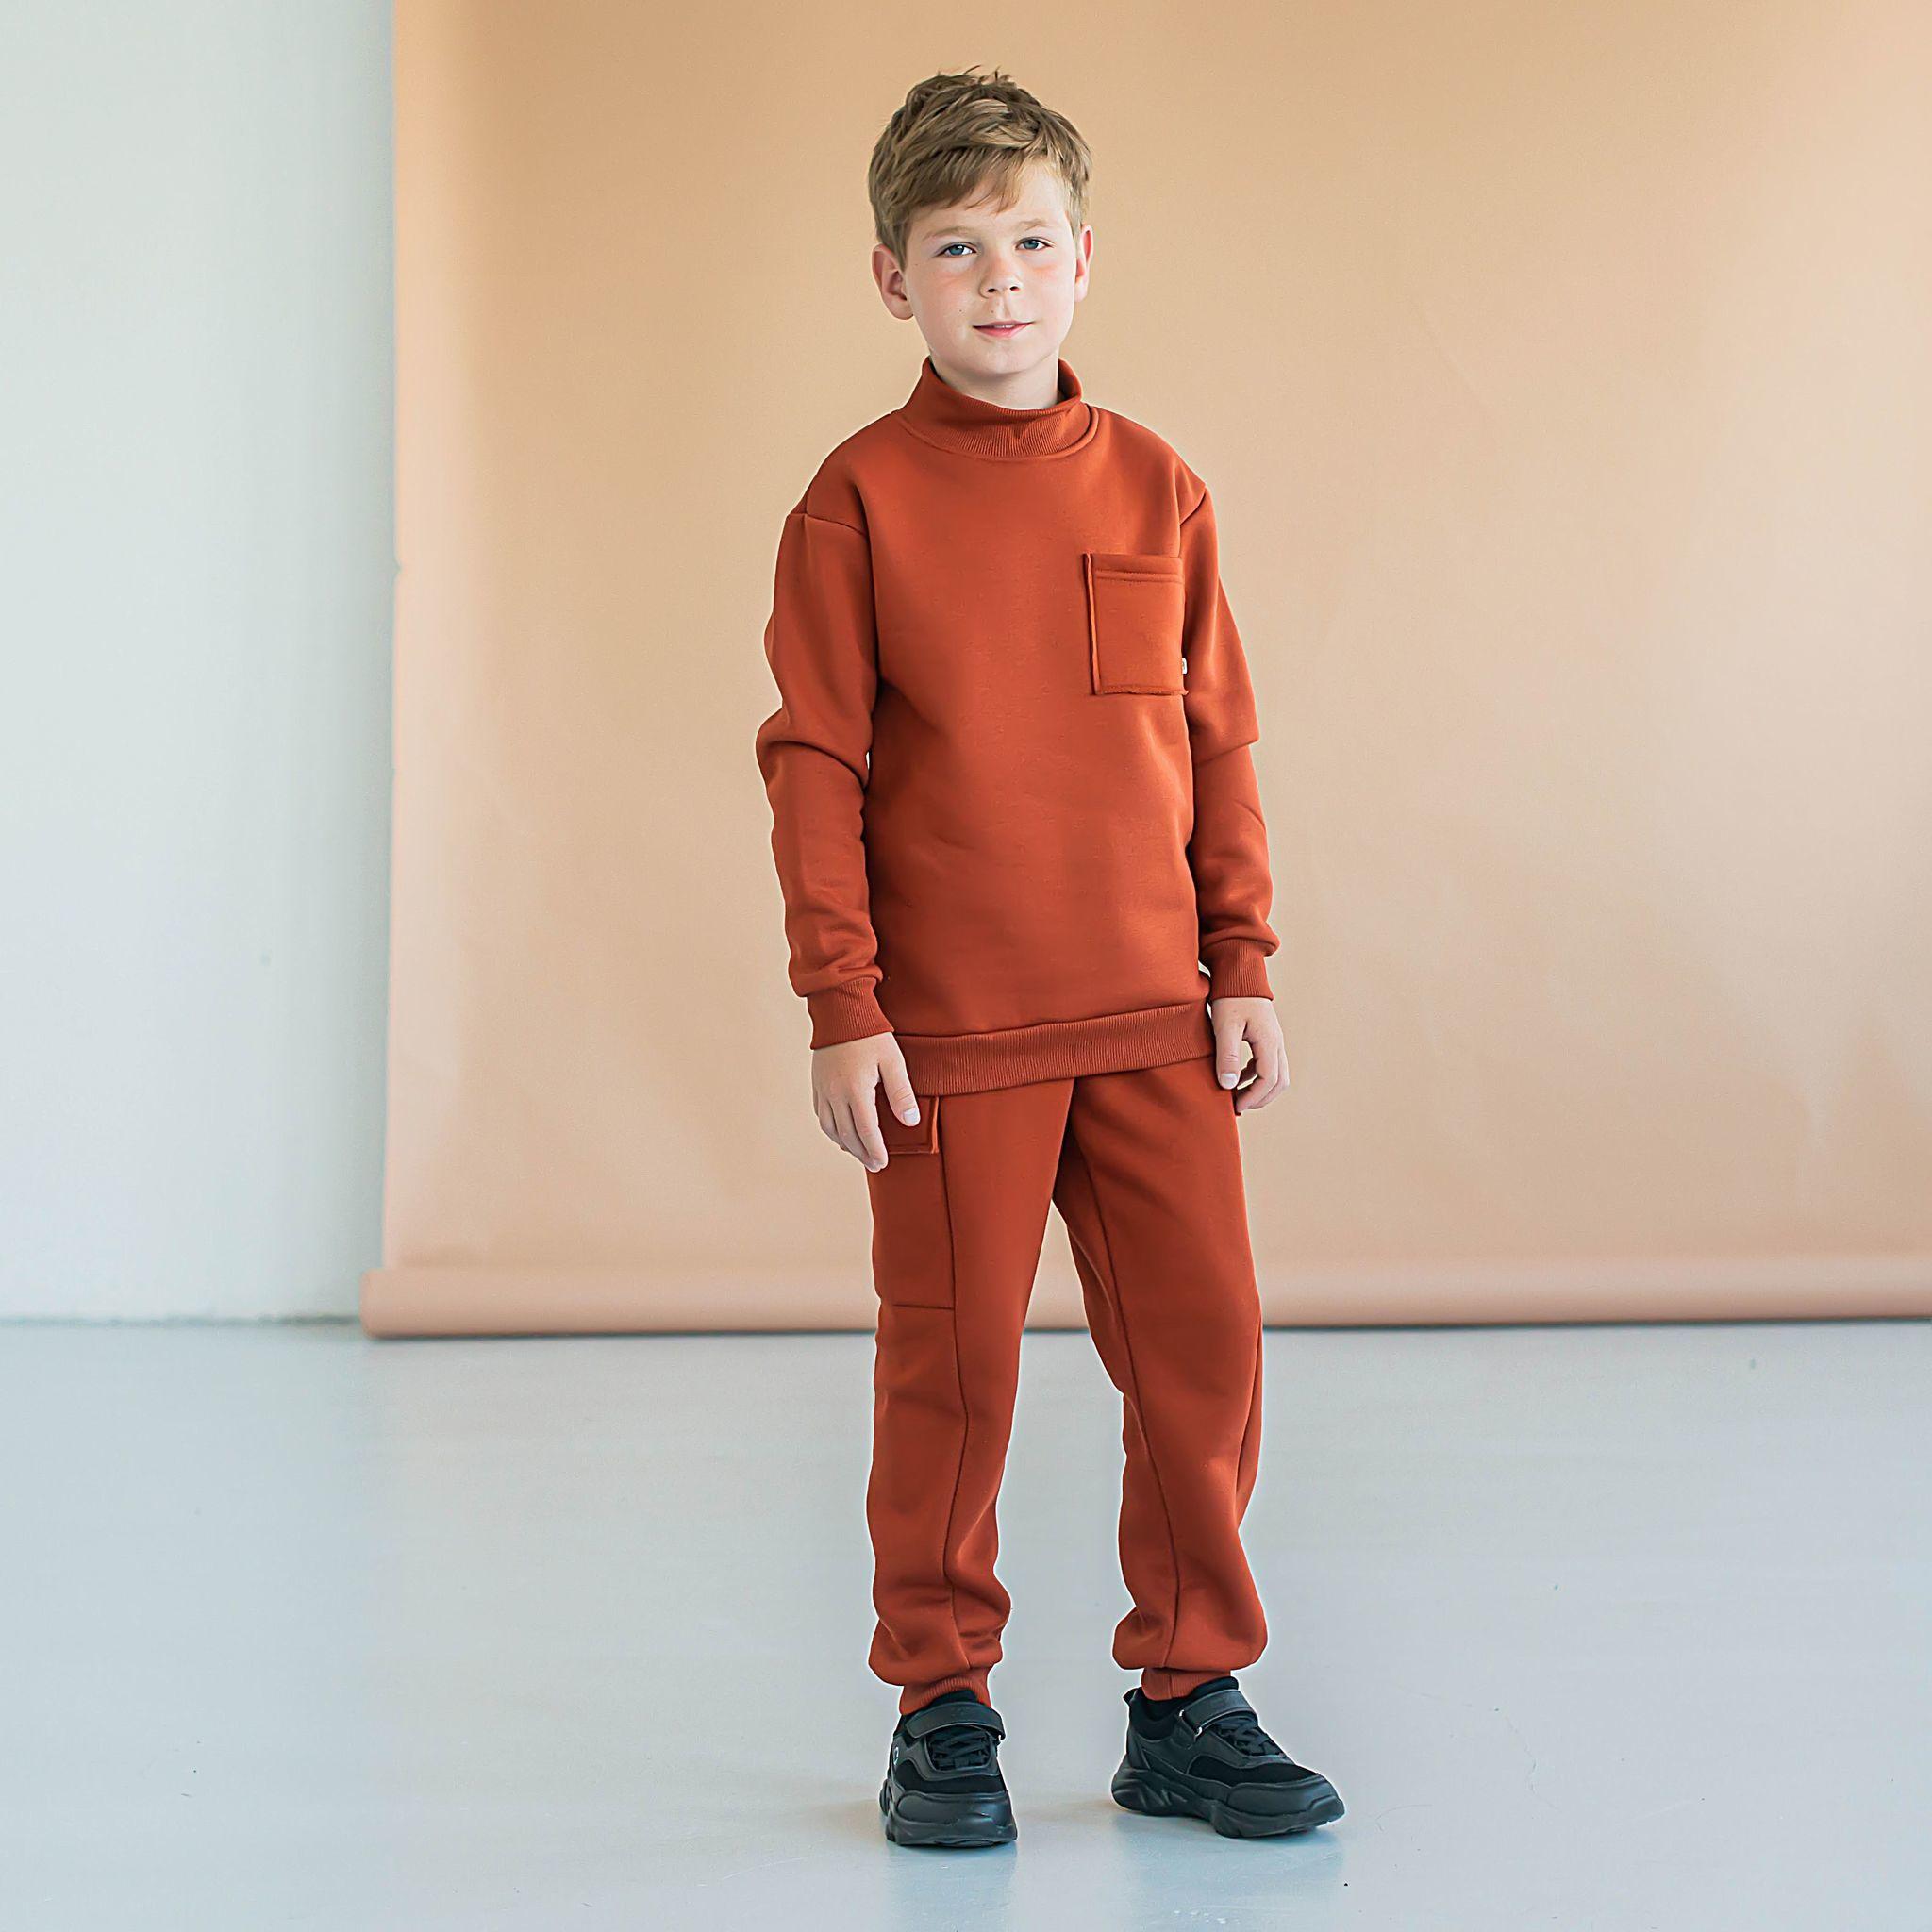 Warm oversized sweatsuit for teens - Terracotta